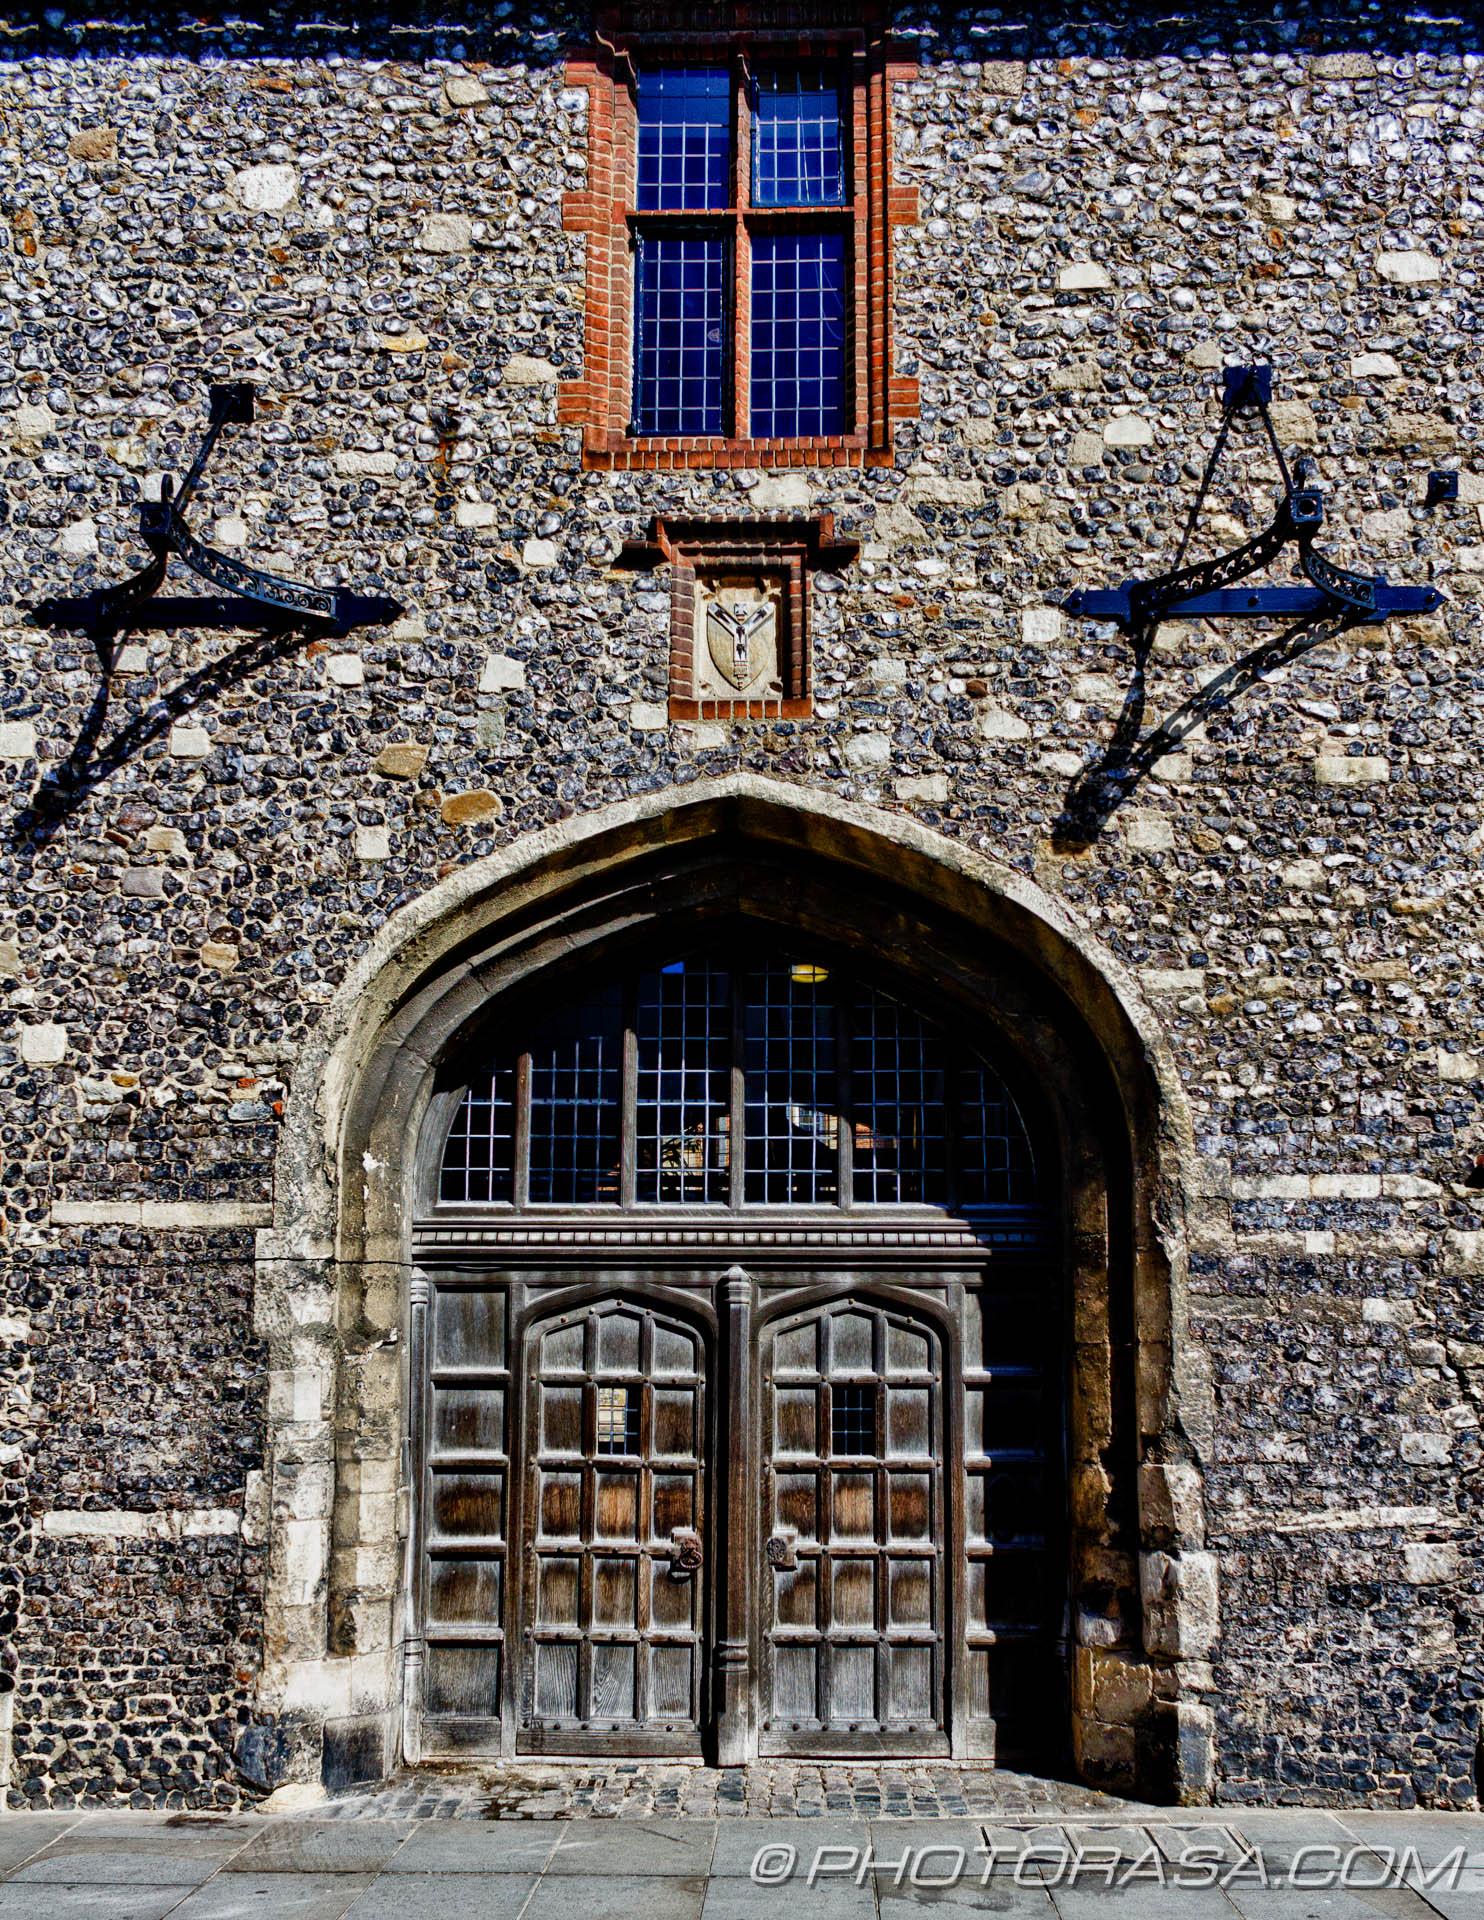 http://photorasa.com/canterbury-trip/old-entrance/